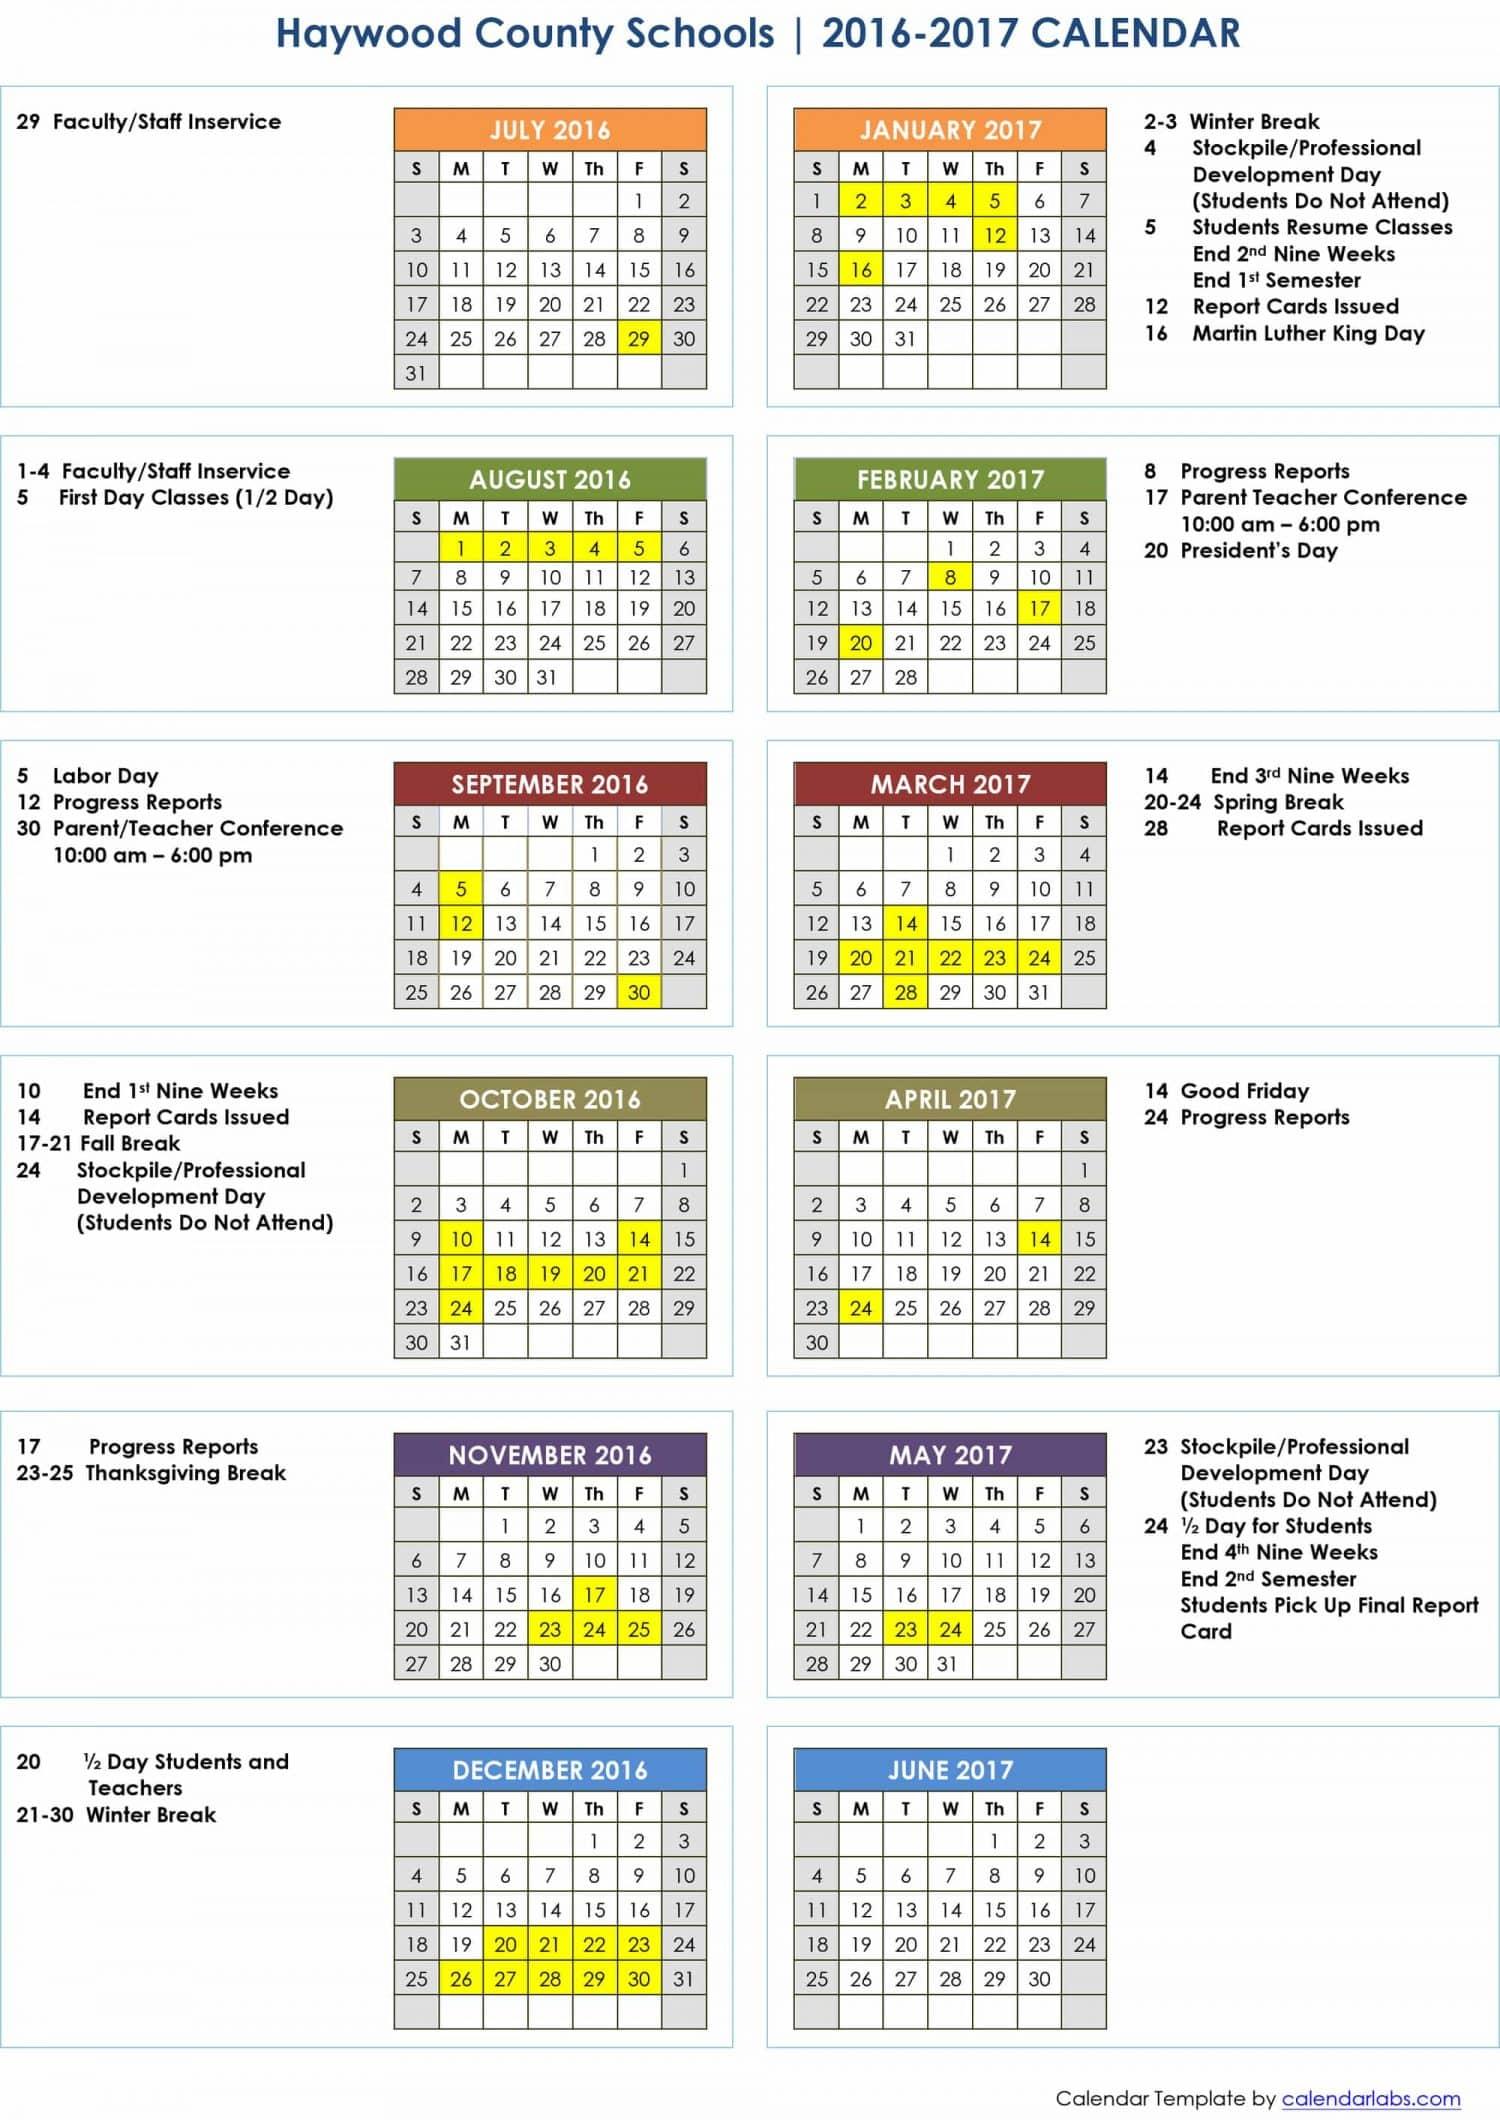 Microsoft Word - 2016-2017 HCS Calendar.doc